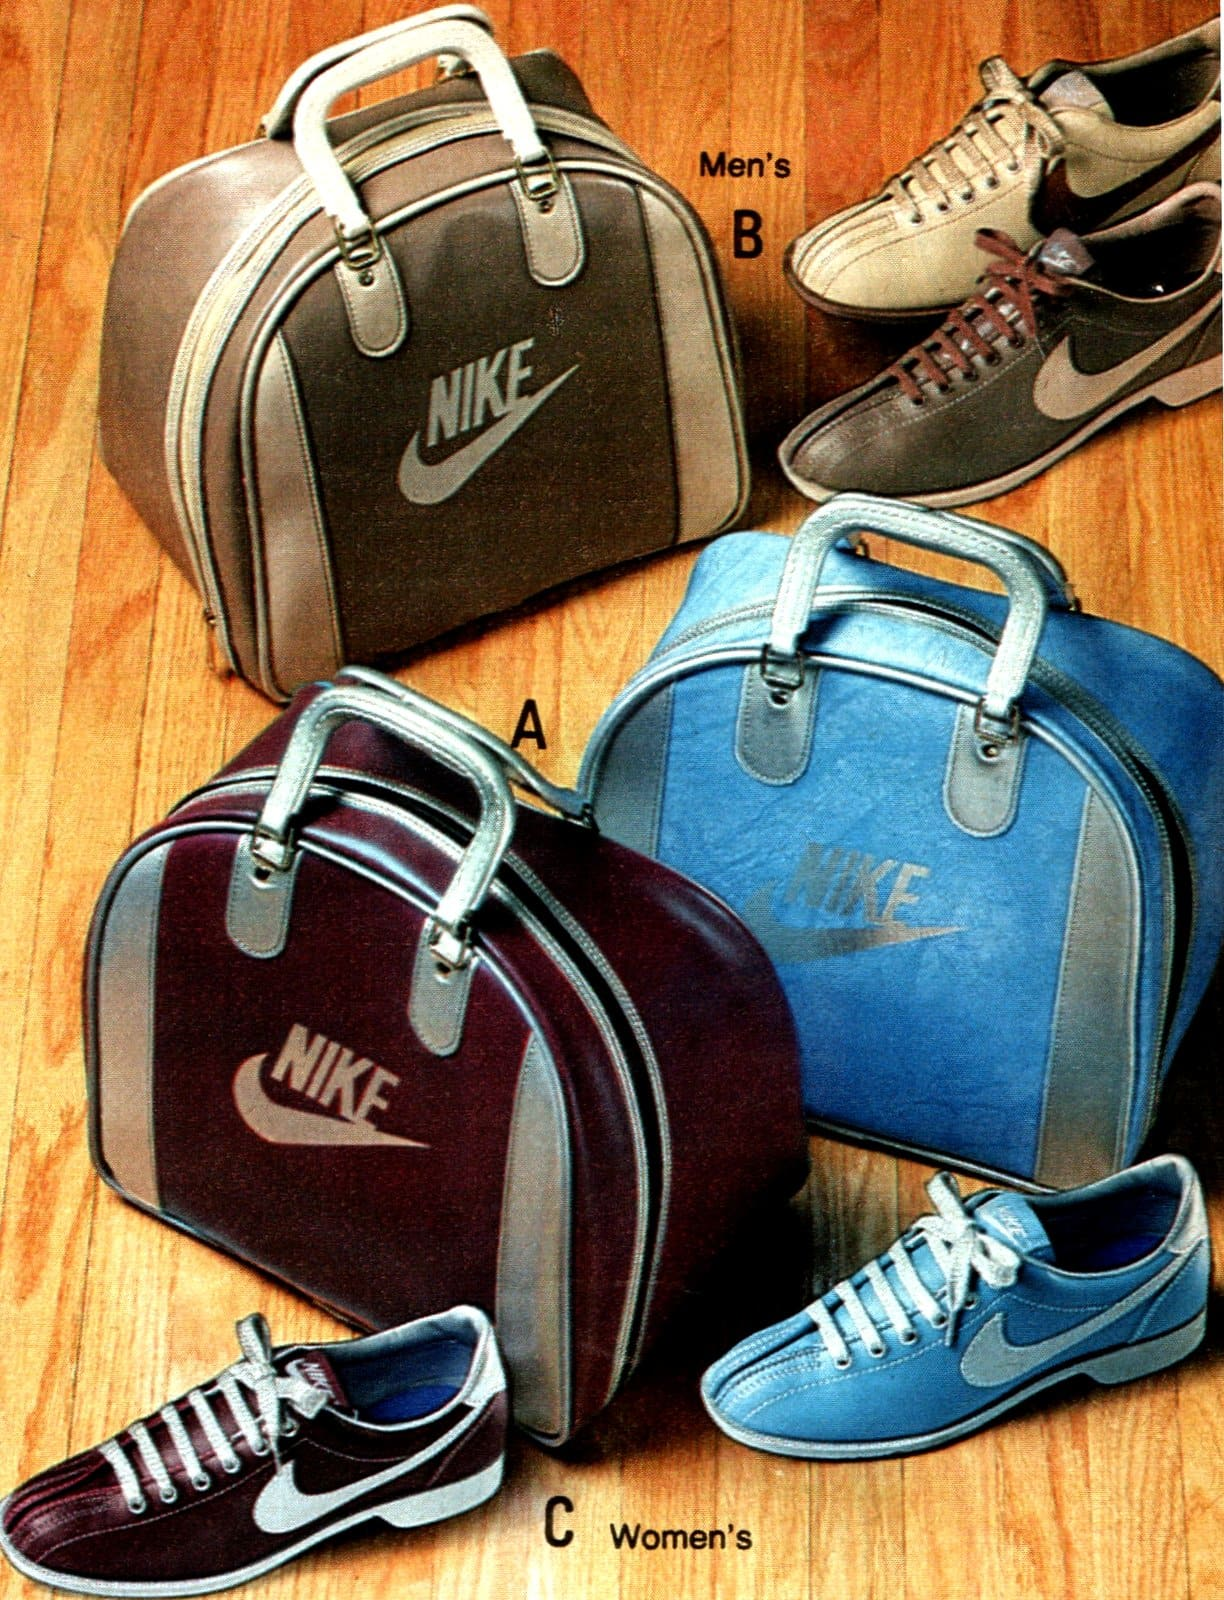 Vintage Nike bowling shoes & bowling ball bag set (1983)